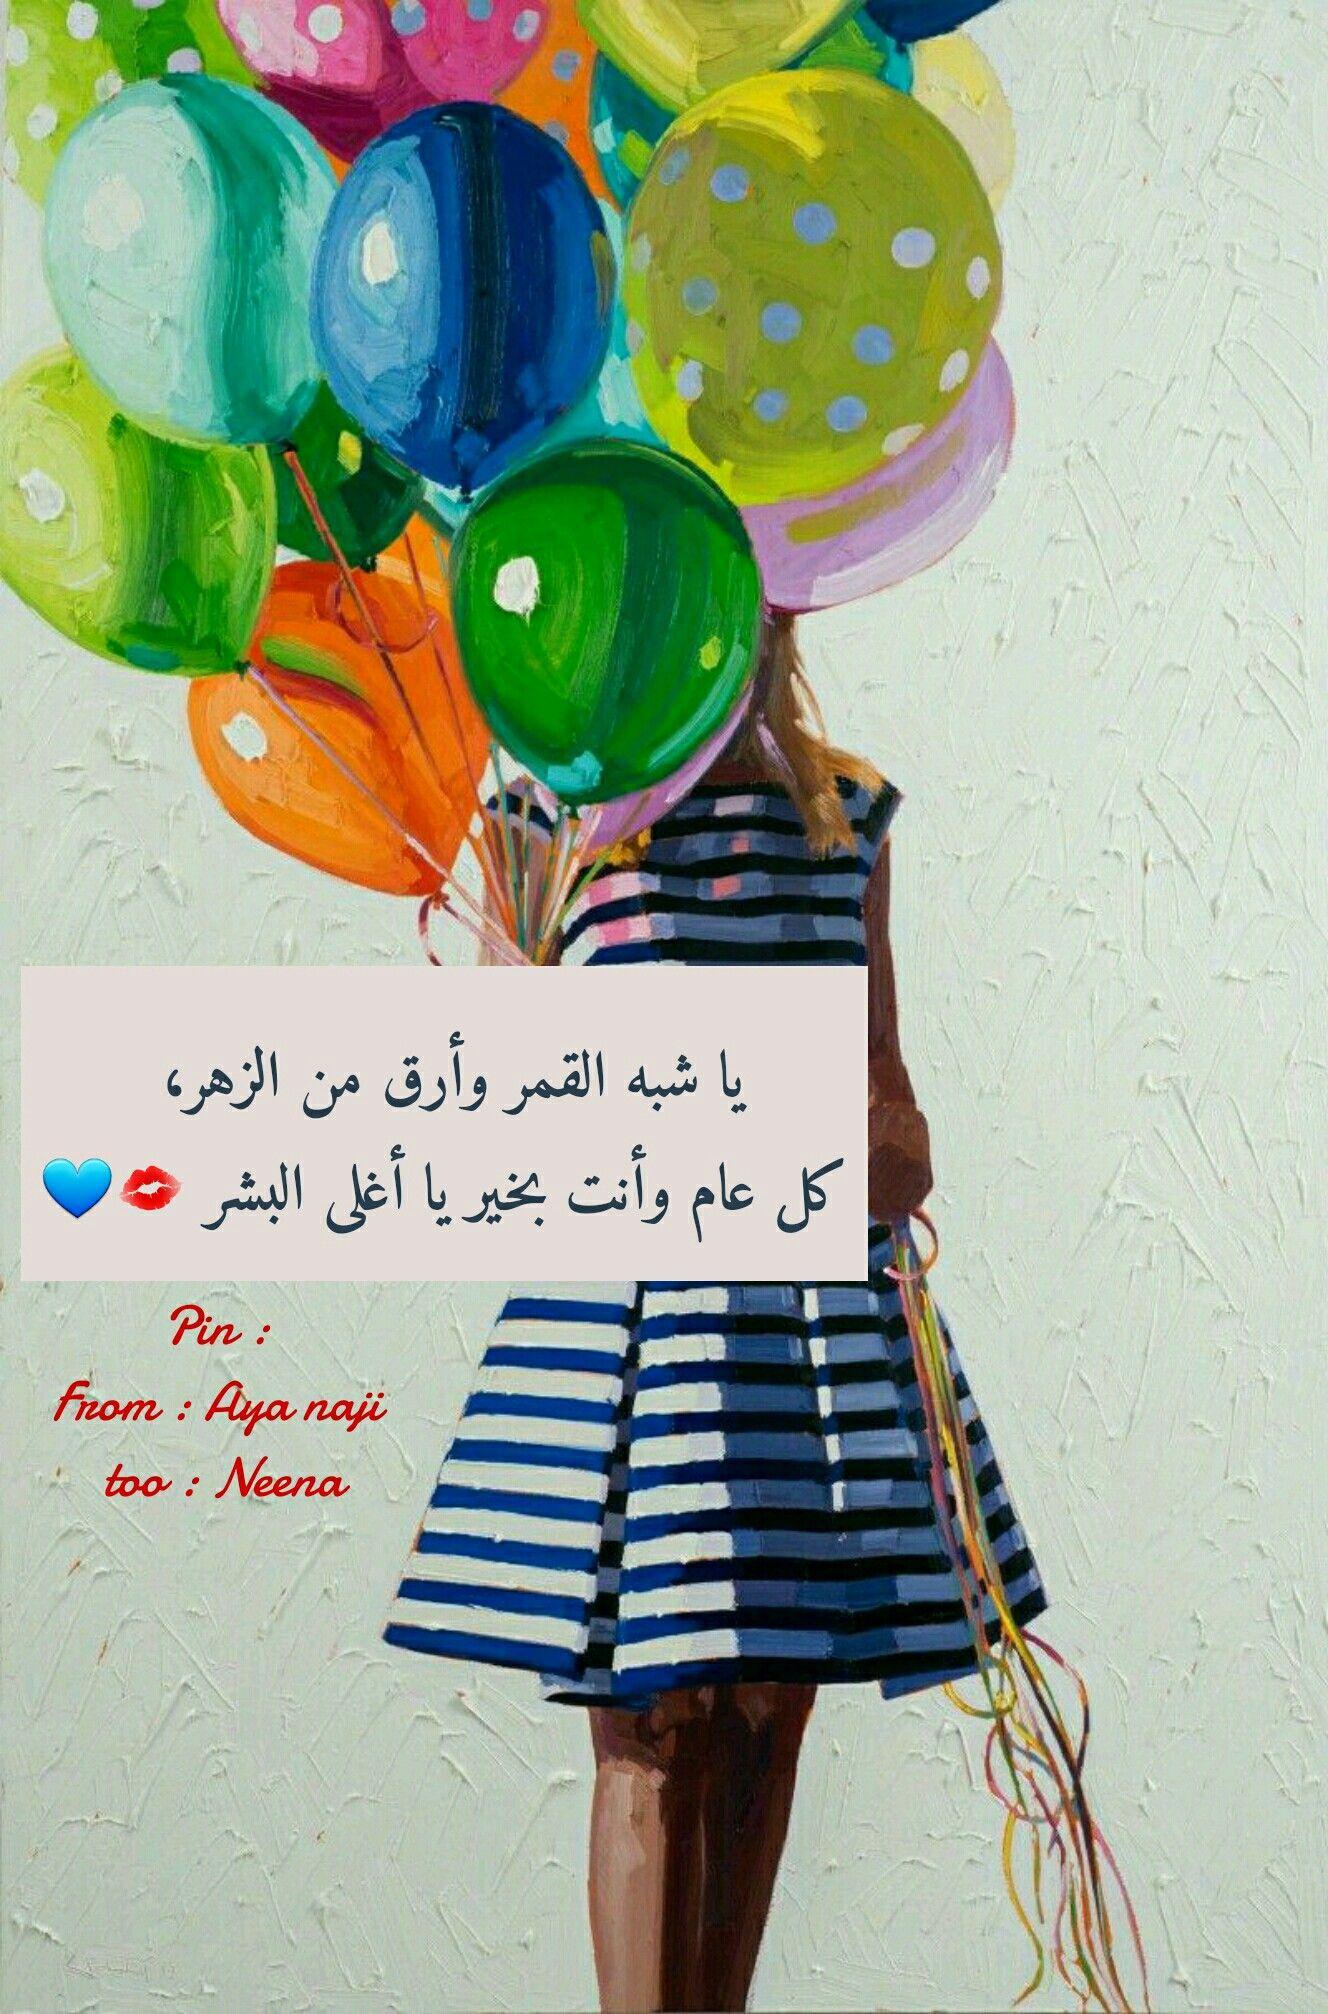 كل عام وانتي بخير والف صحه وسلامه Neena وعقبال 100 سنه Happy Birthday Wishes Cards Happy Birthday Love Birthday Girl Quotes